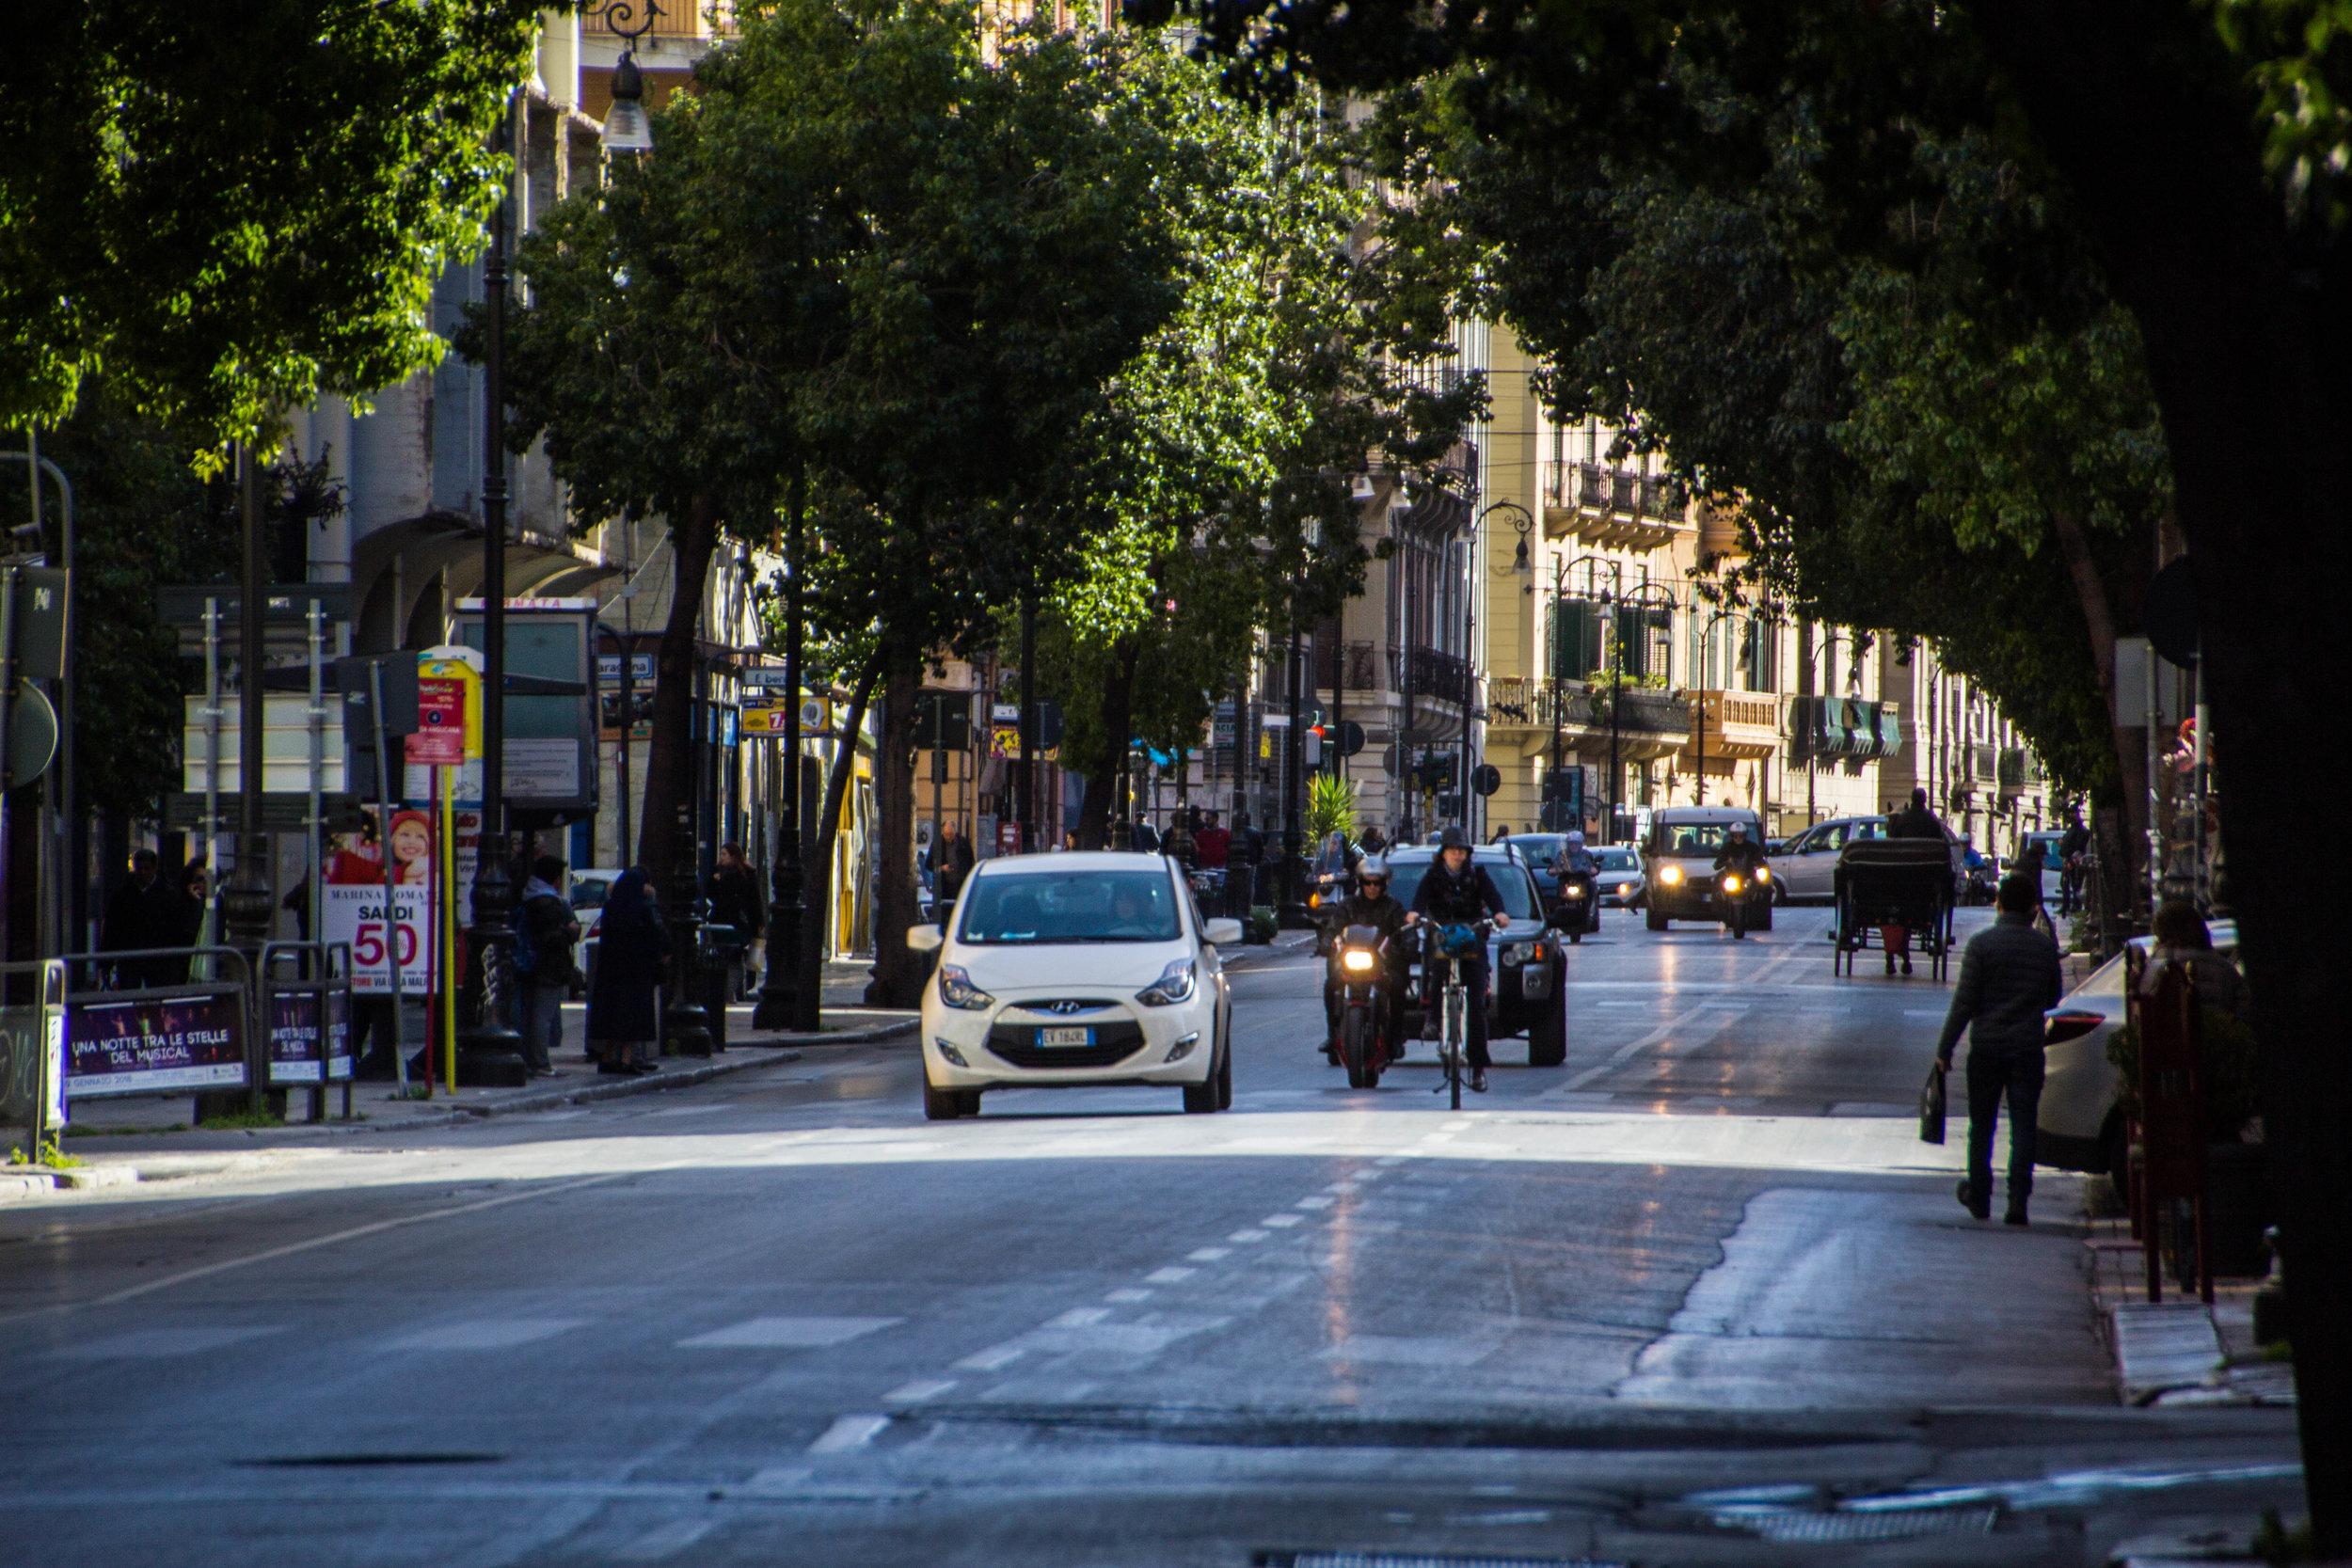 streets-palermo-sicily-2-2.jpg